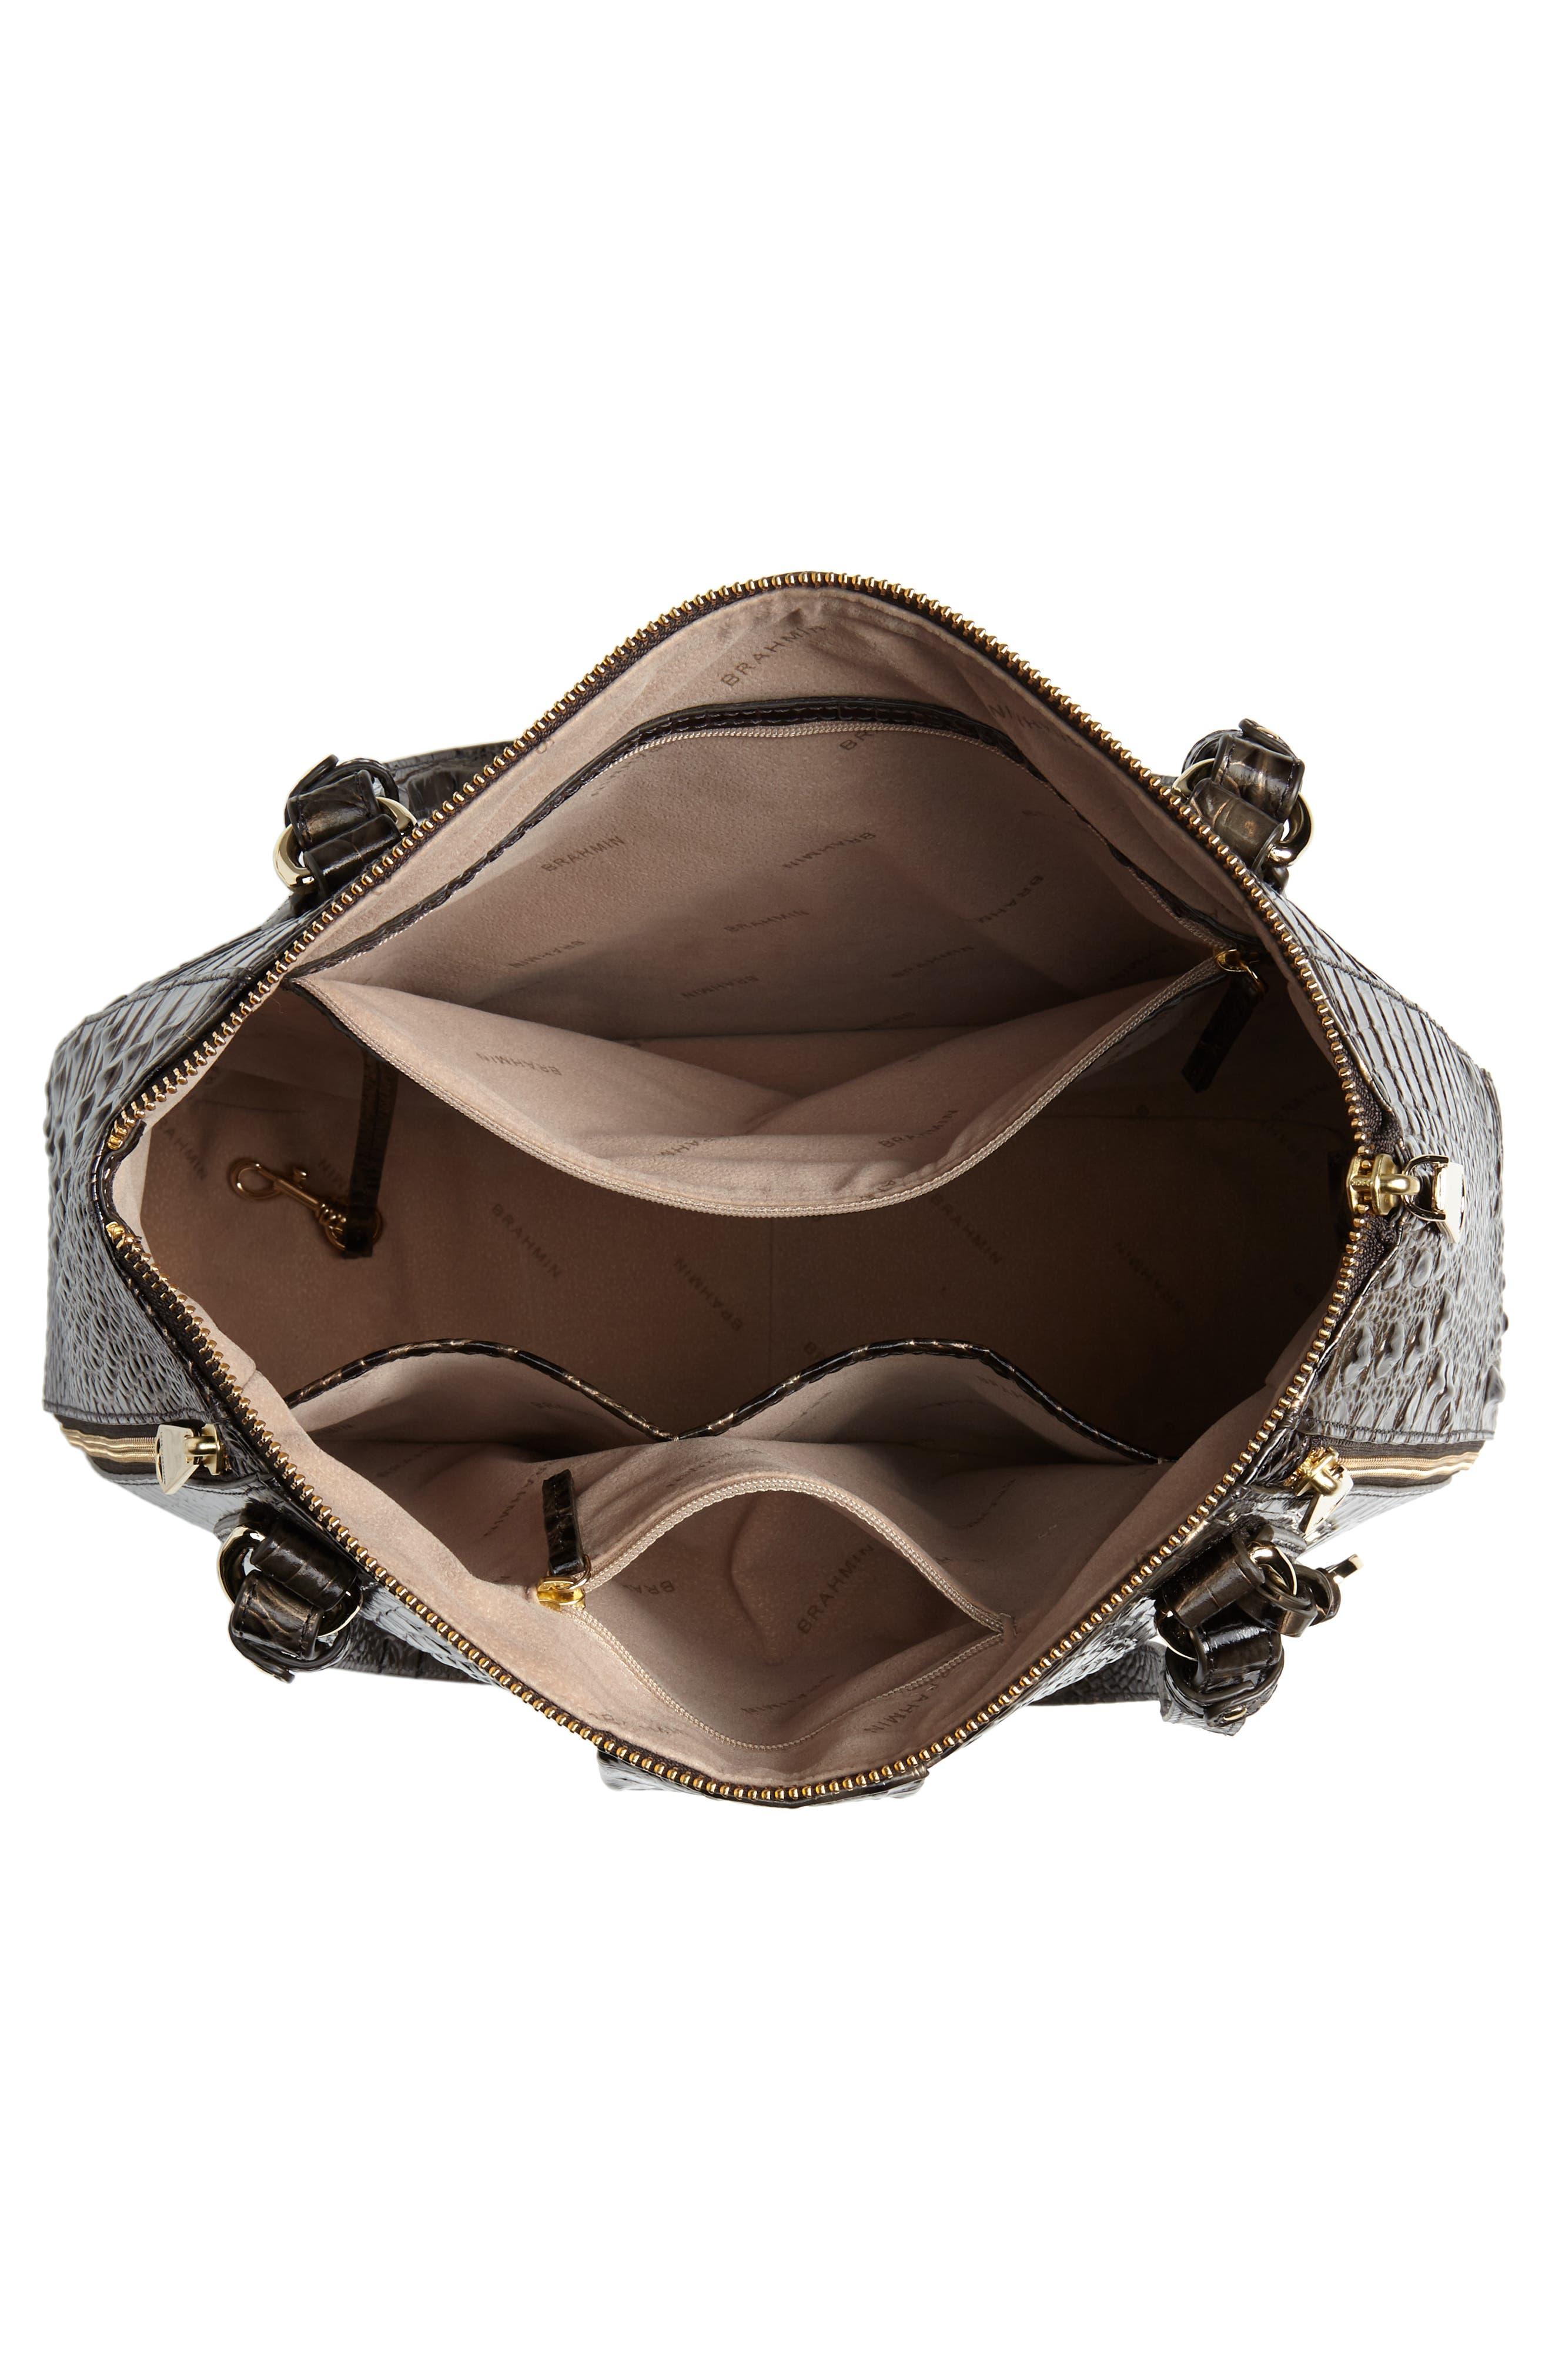 Melbourne - Adina Croc Embossed Leather Satchel,                             Alternate thumbnail 4, color,                             GRAPHITE